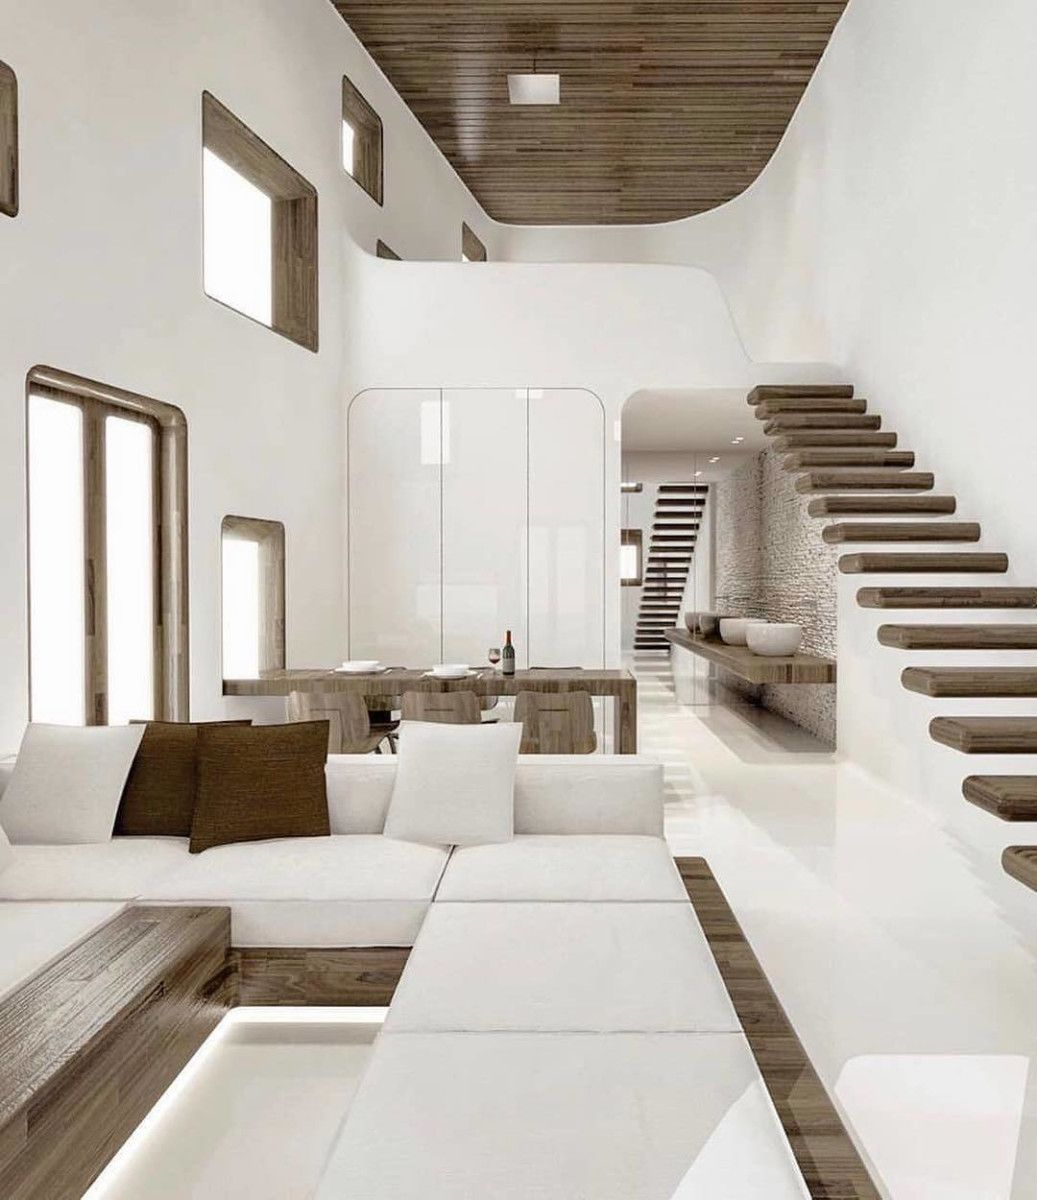 Minimal Interior Design Inspiration 213 Minimalism Interior Minimal Interior Design House Architecture Design